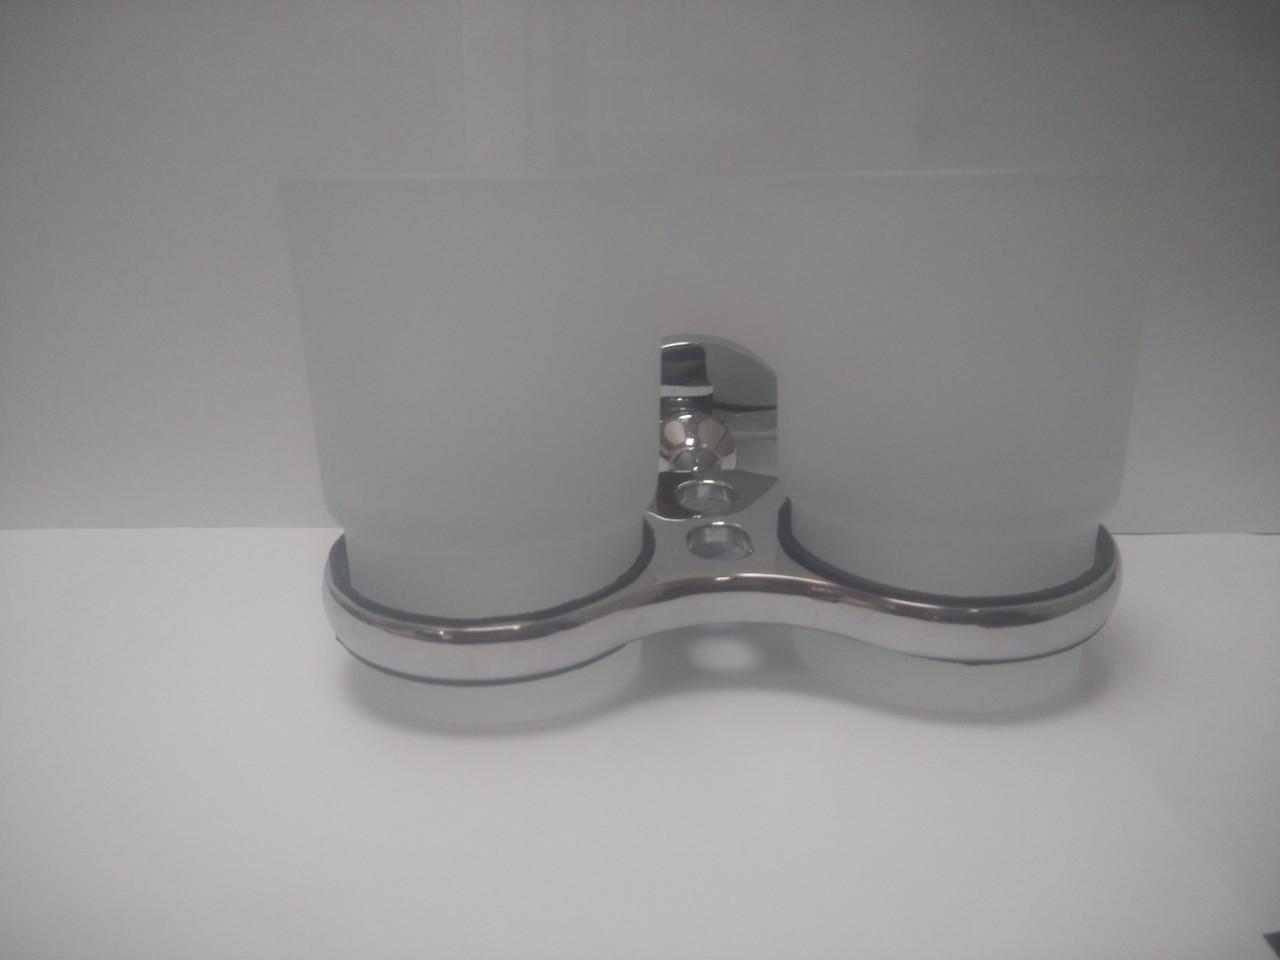 Стакан для зубных щеток двойной, ROUND 71907